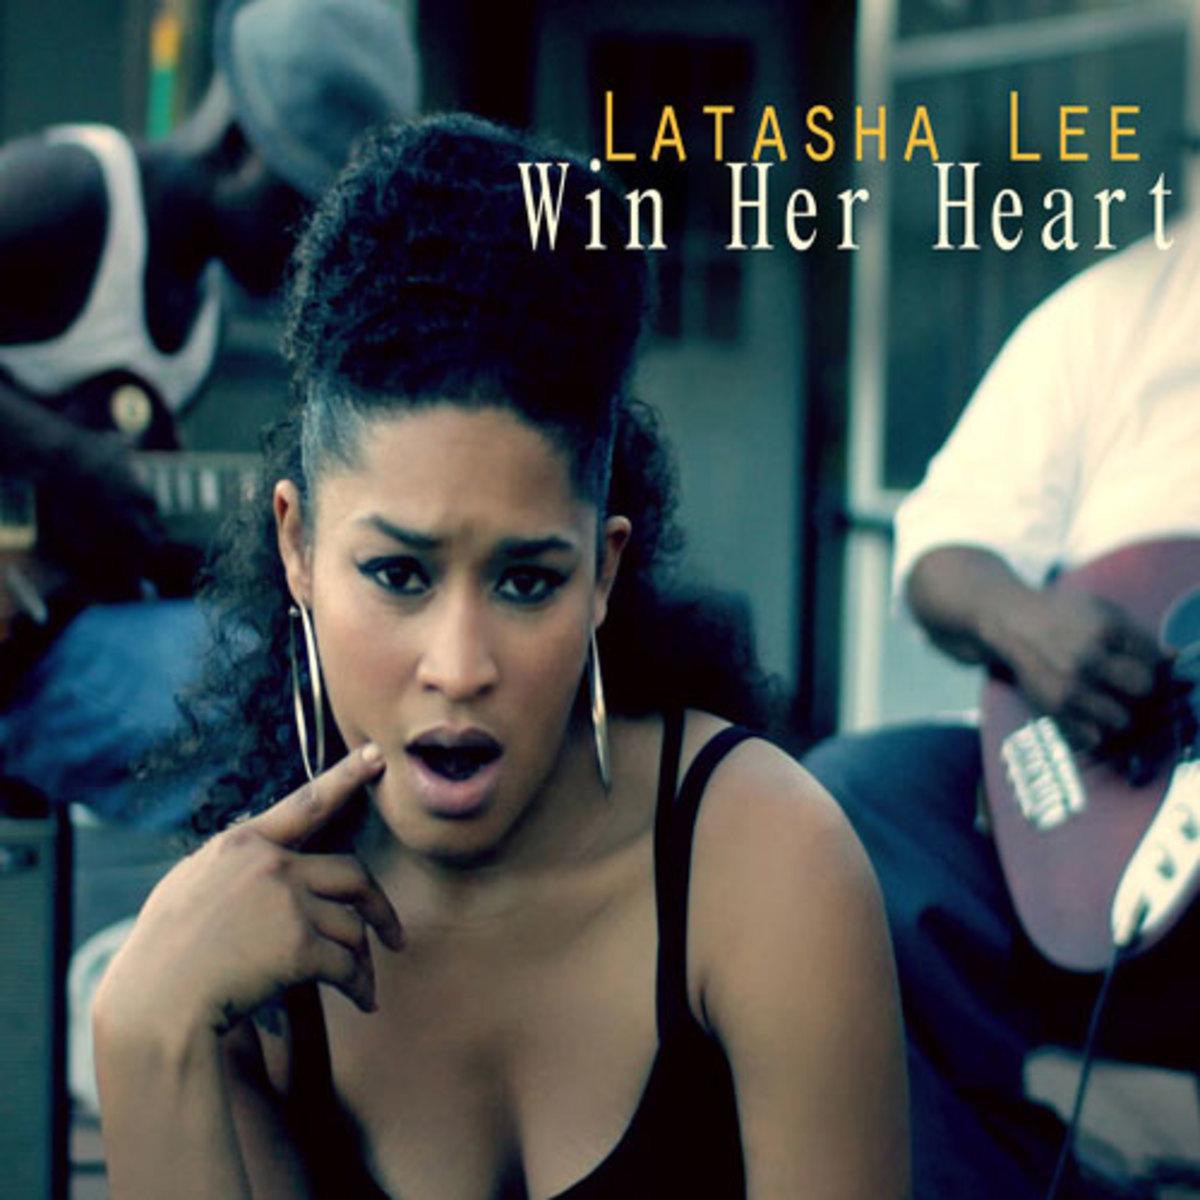 latashalee-winherheart.jpg